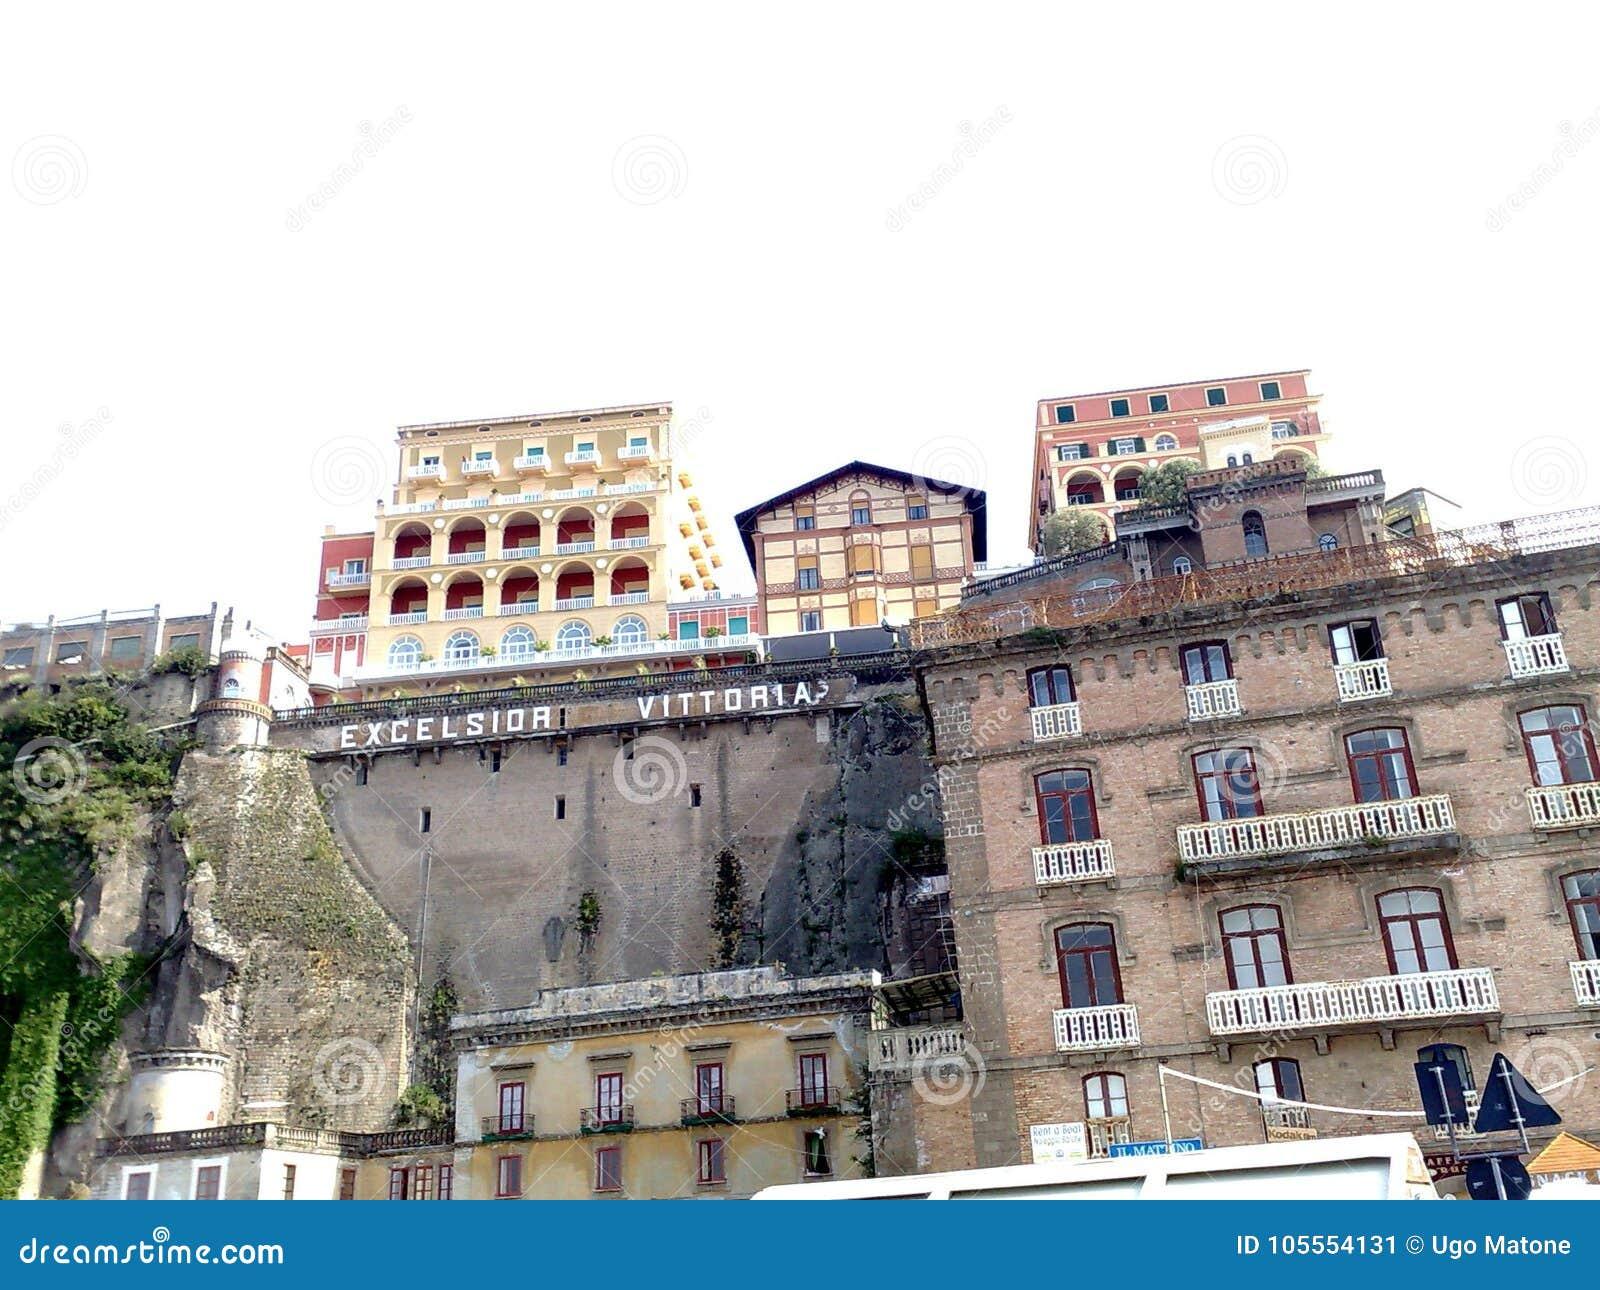 Hotel excelsior Vittoria Sorrento vom Hafen